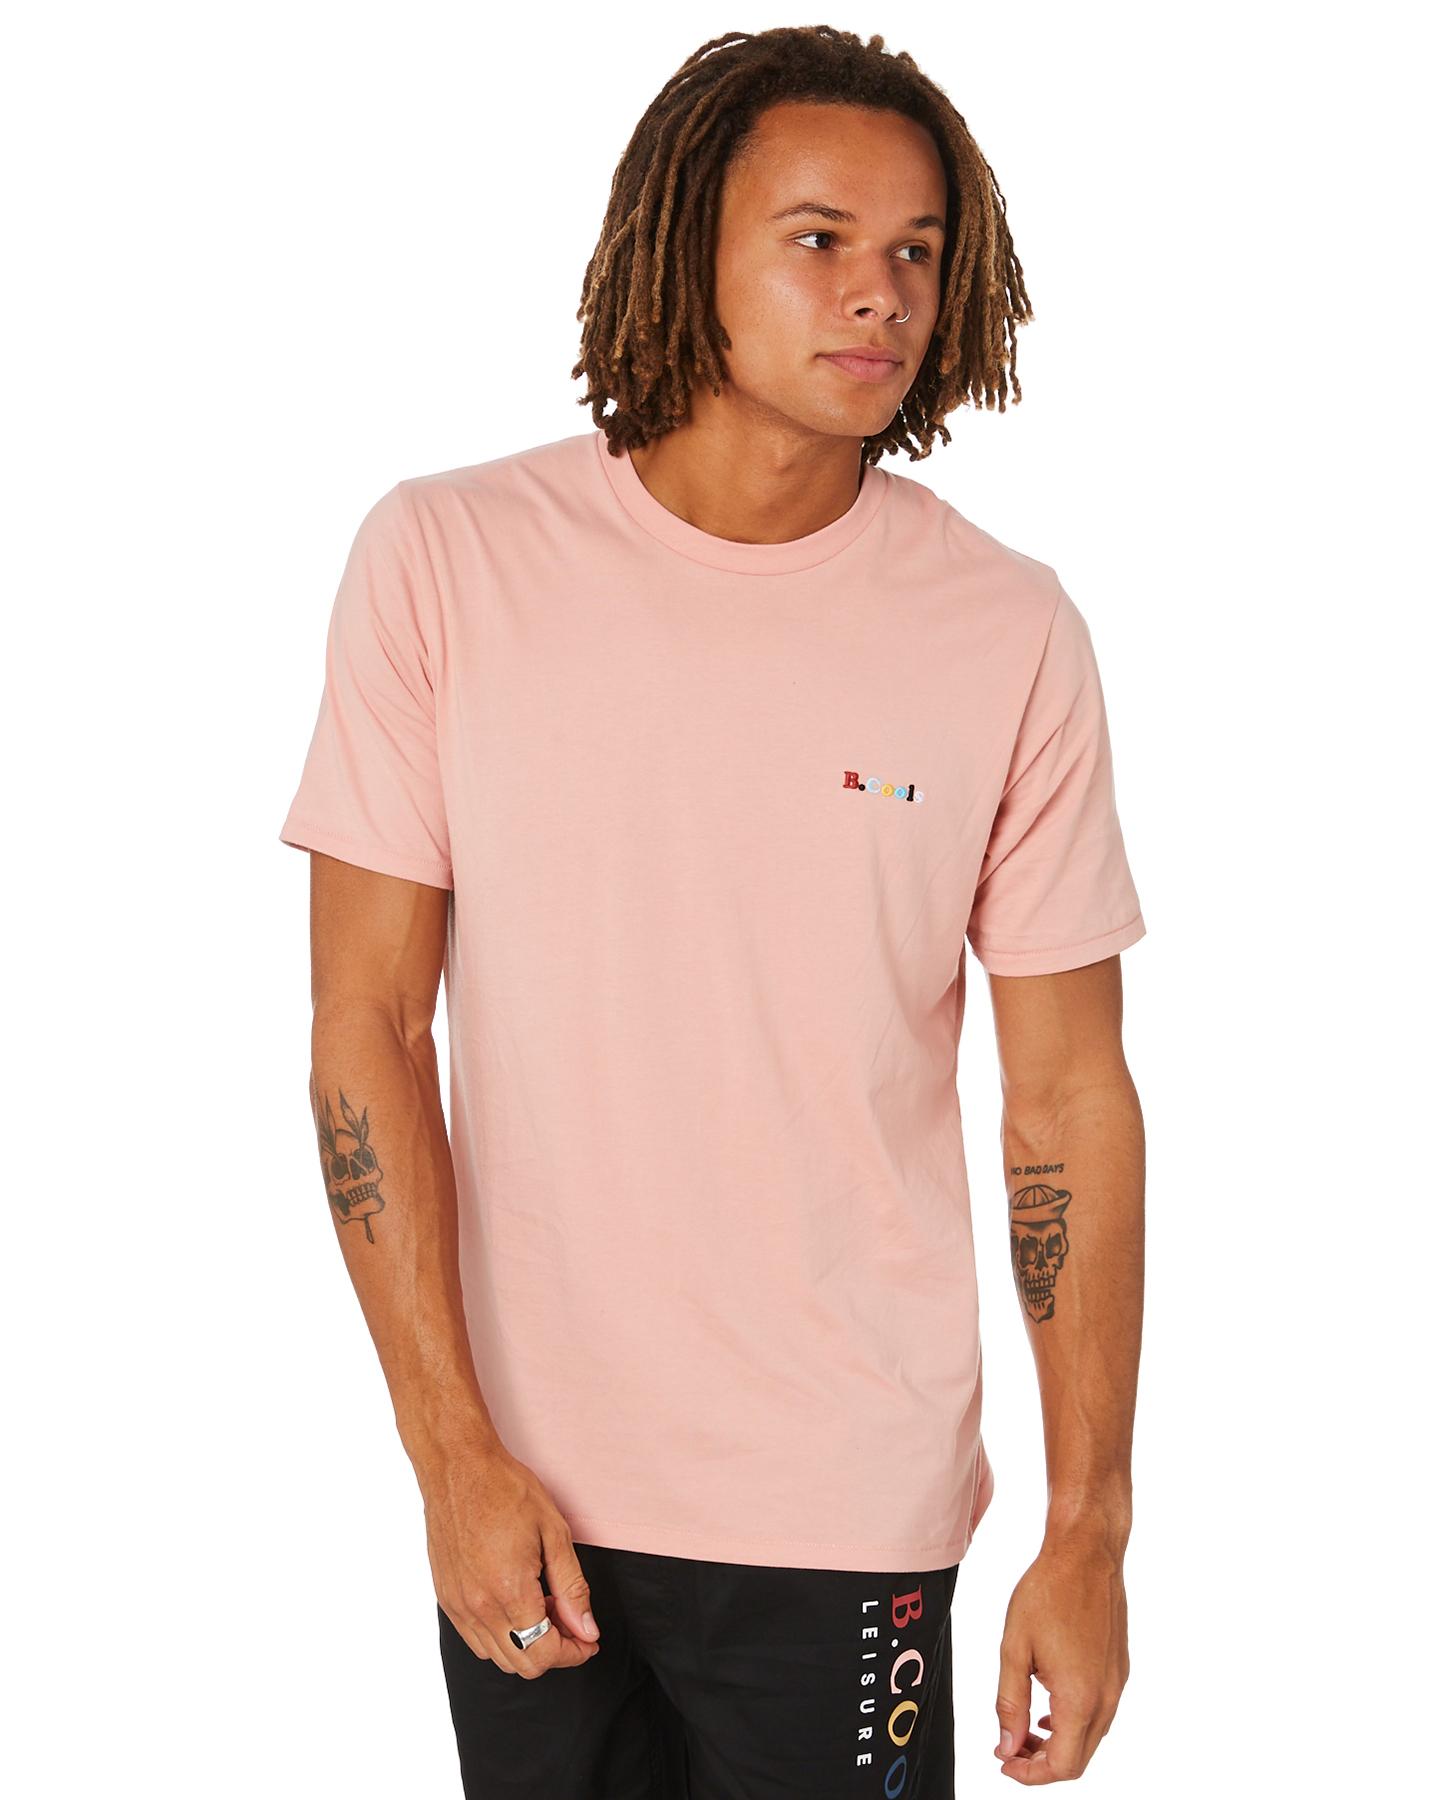 Barney Cools Retro Embro Mens Tee Dusty Pink